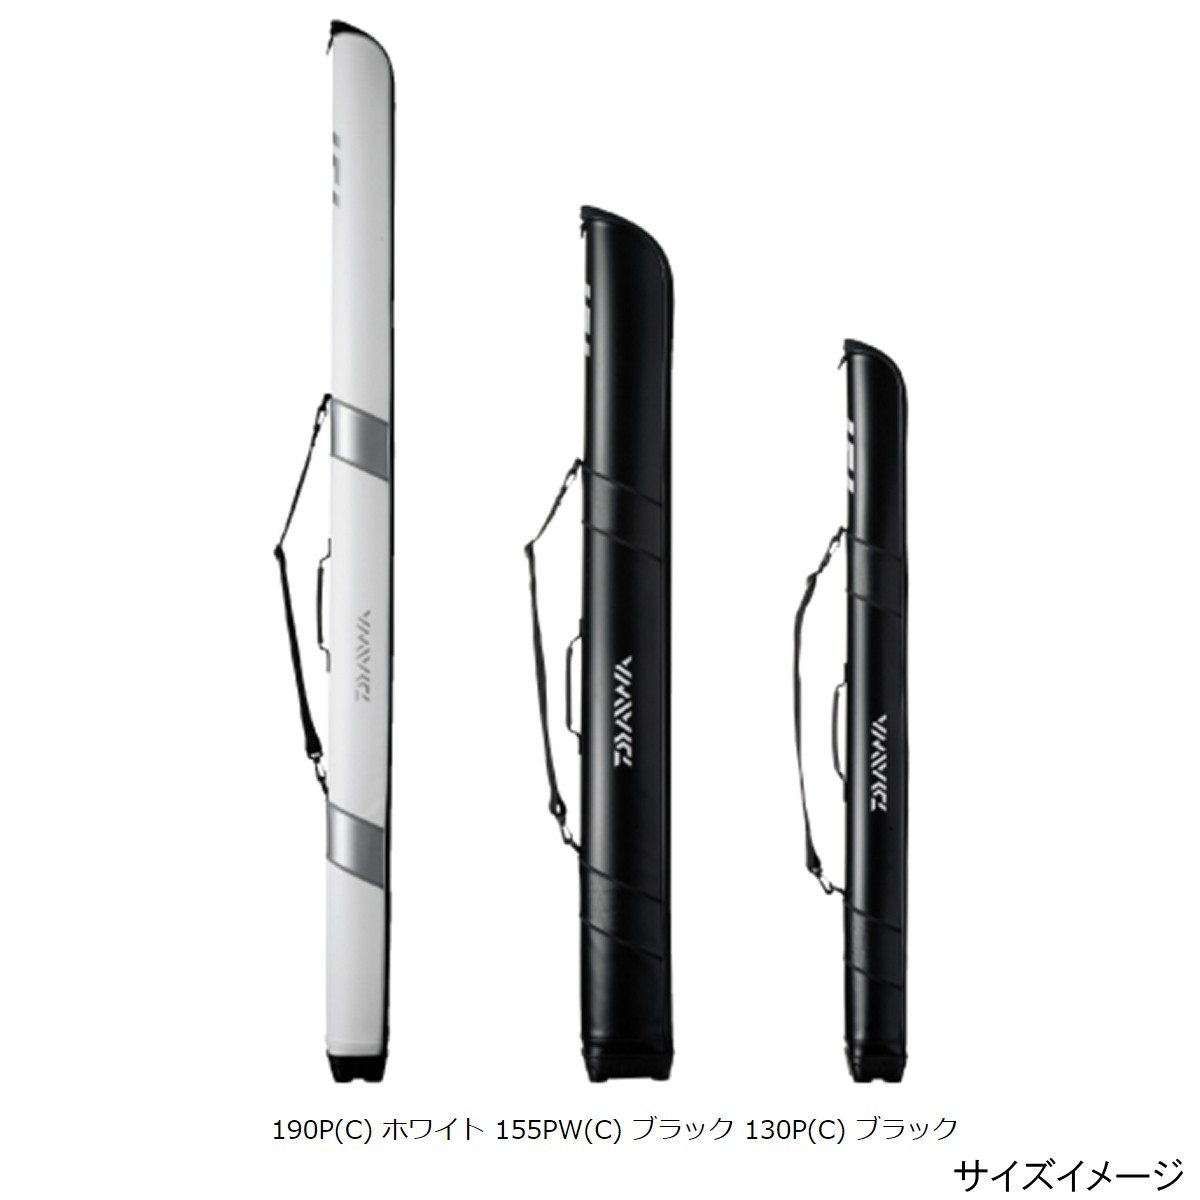 Daiwa light rod case 190P(C) black